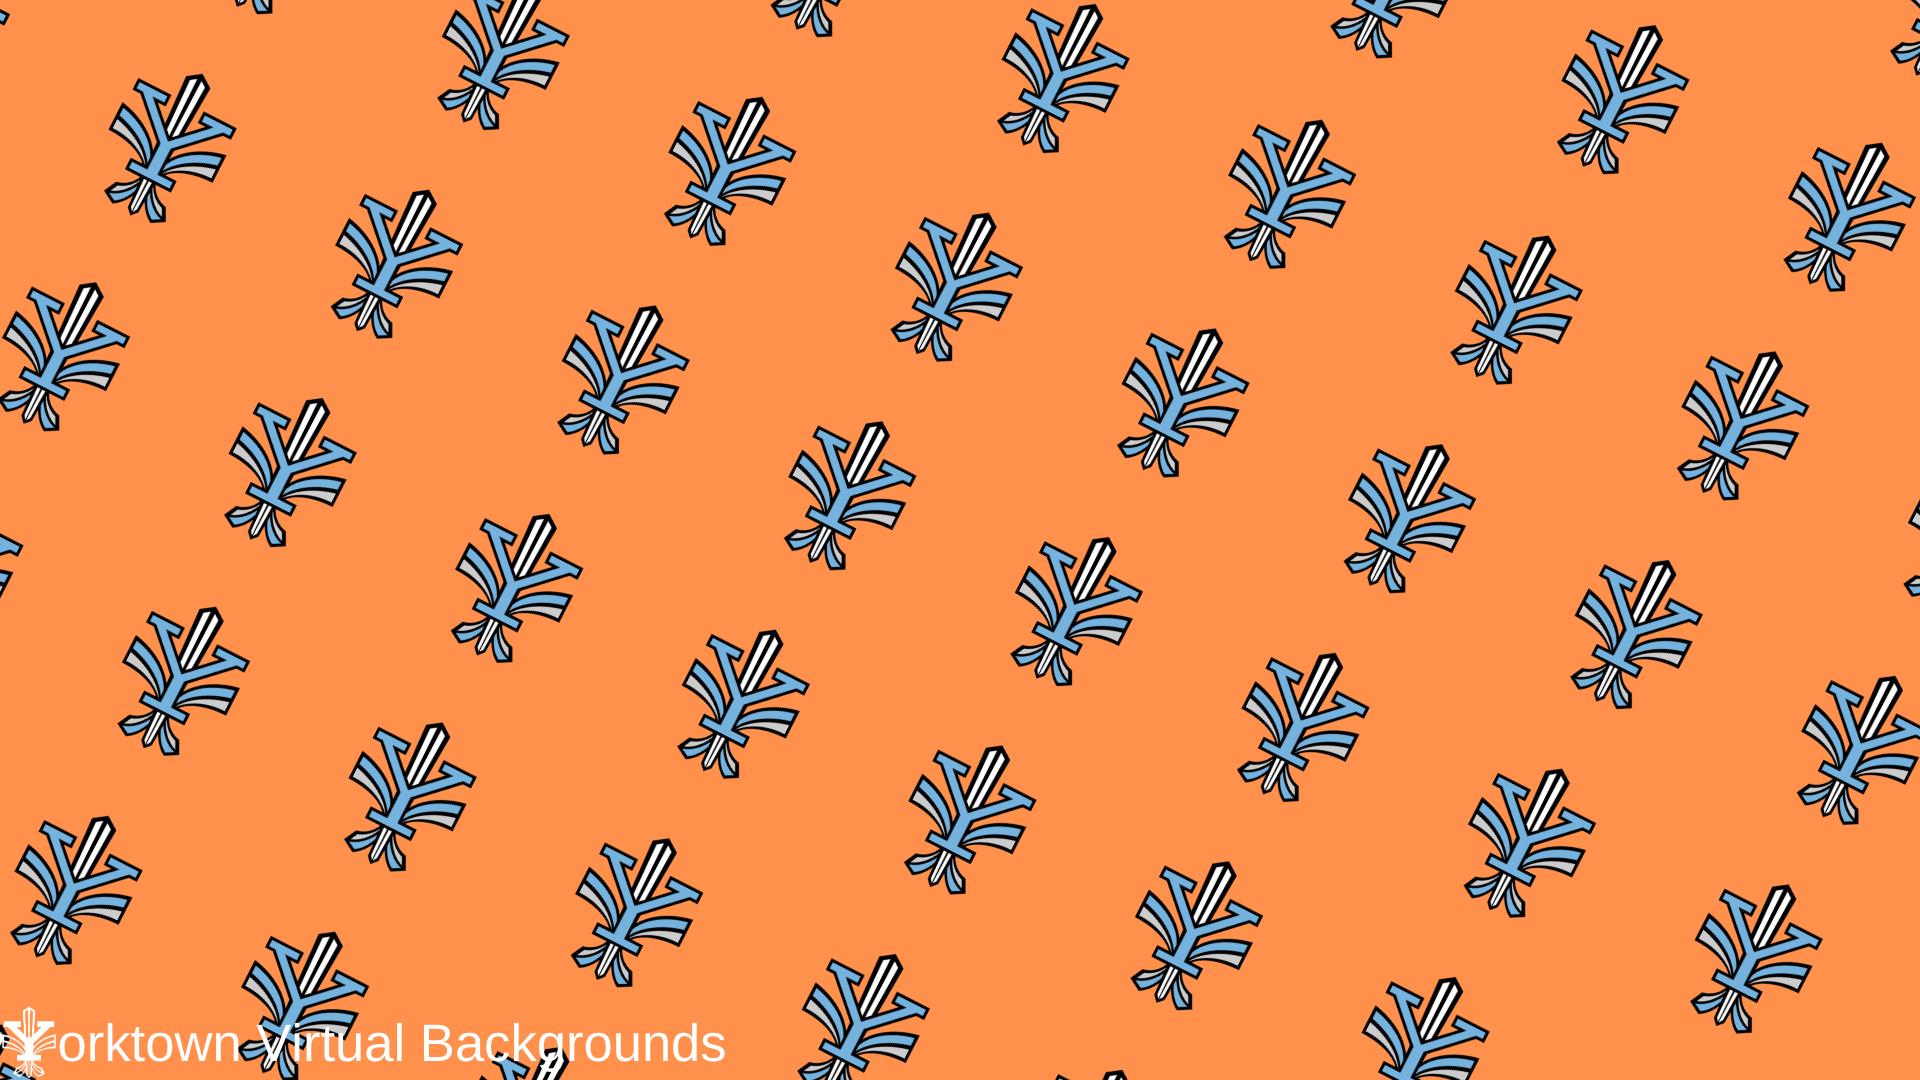 Yorktown Logo Wallpaper for Teams - Orange - Diagonal